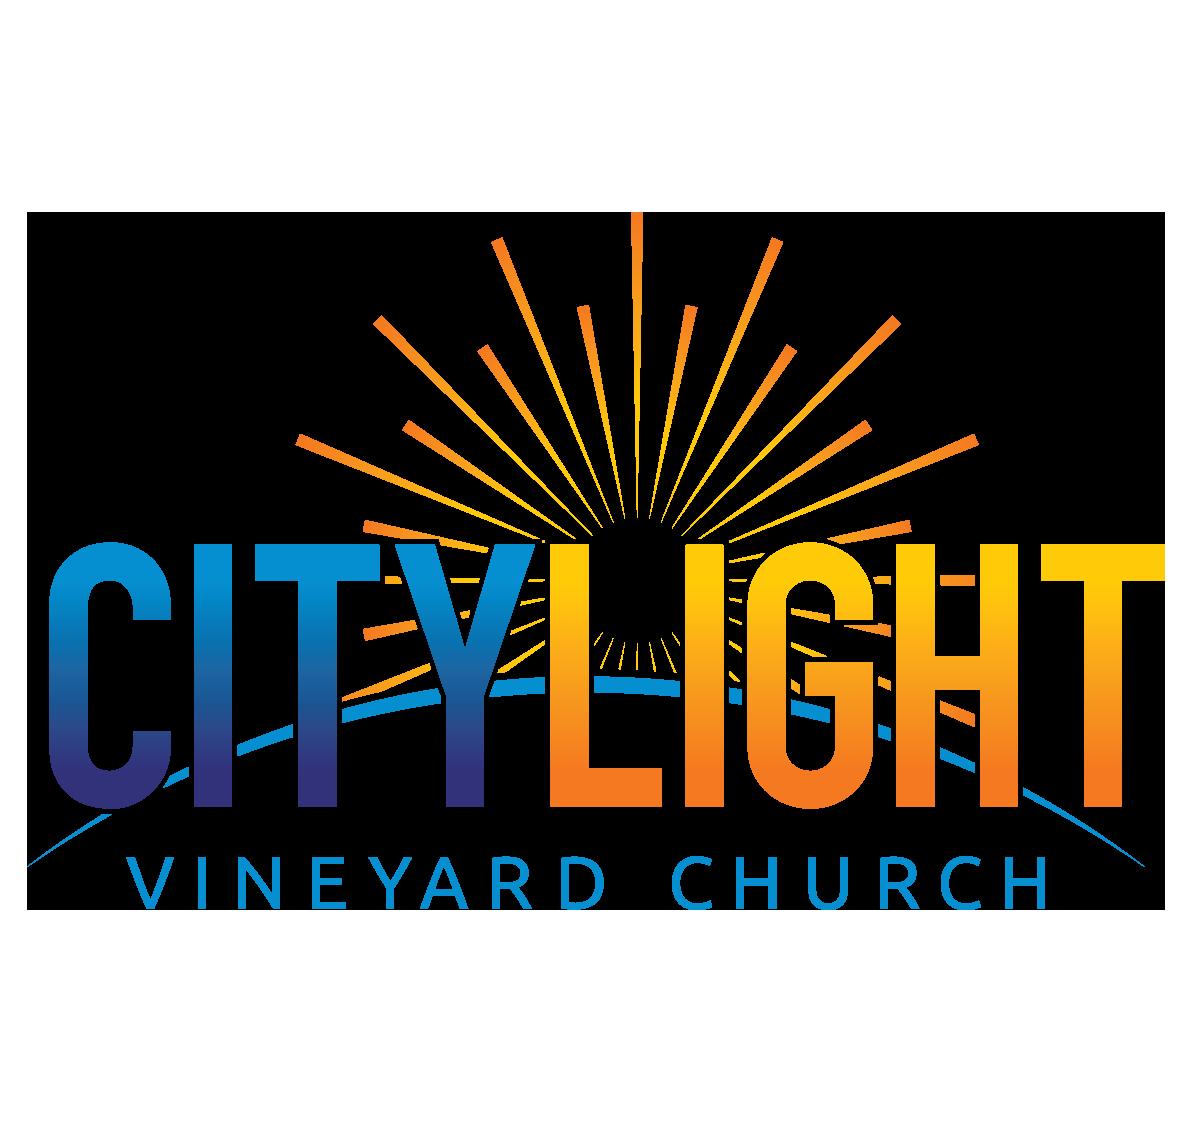 CityLight Vineyard Church